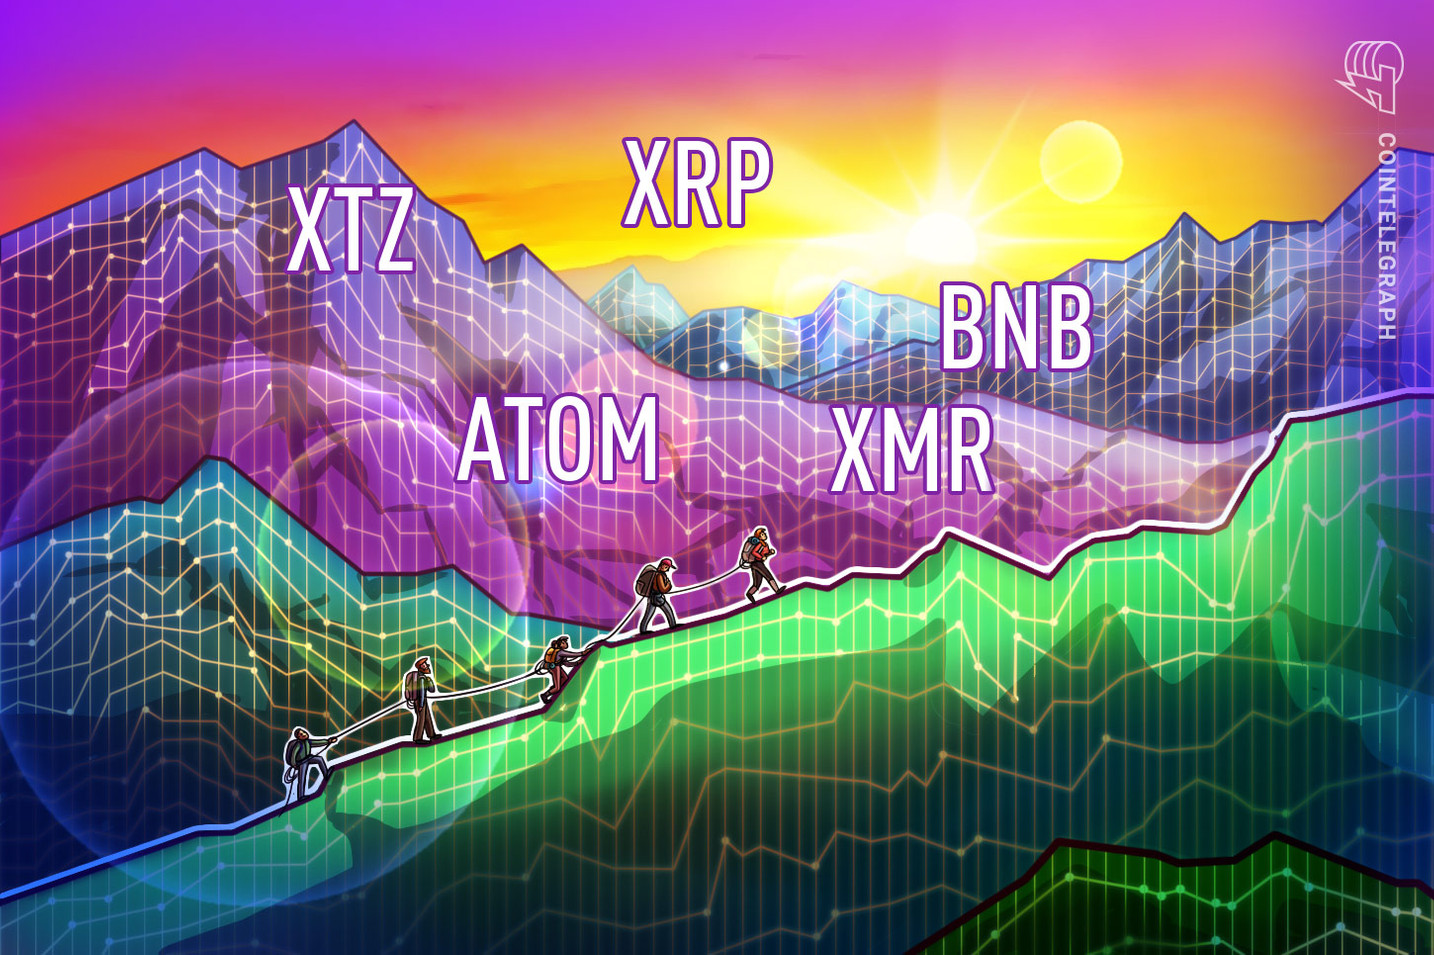 Las 5 criptos con mejor desempeño de esta semana: XTZ, ATOM, XRP, XMR, BNB